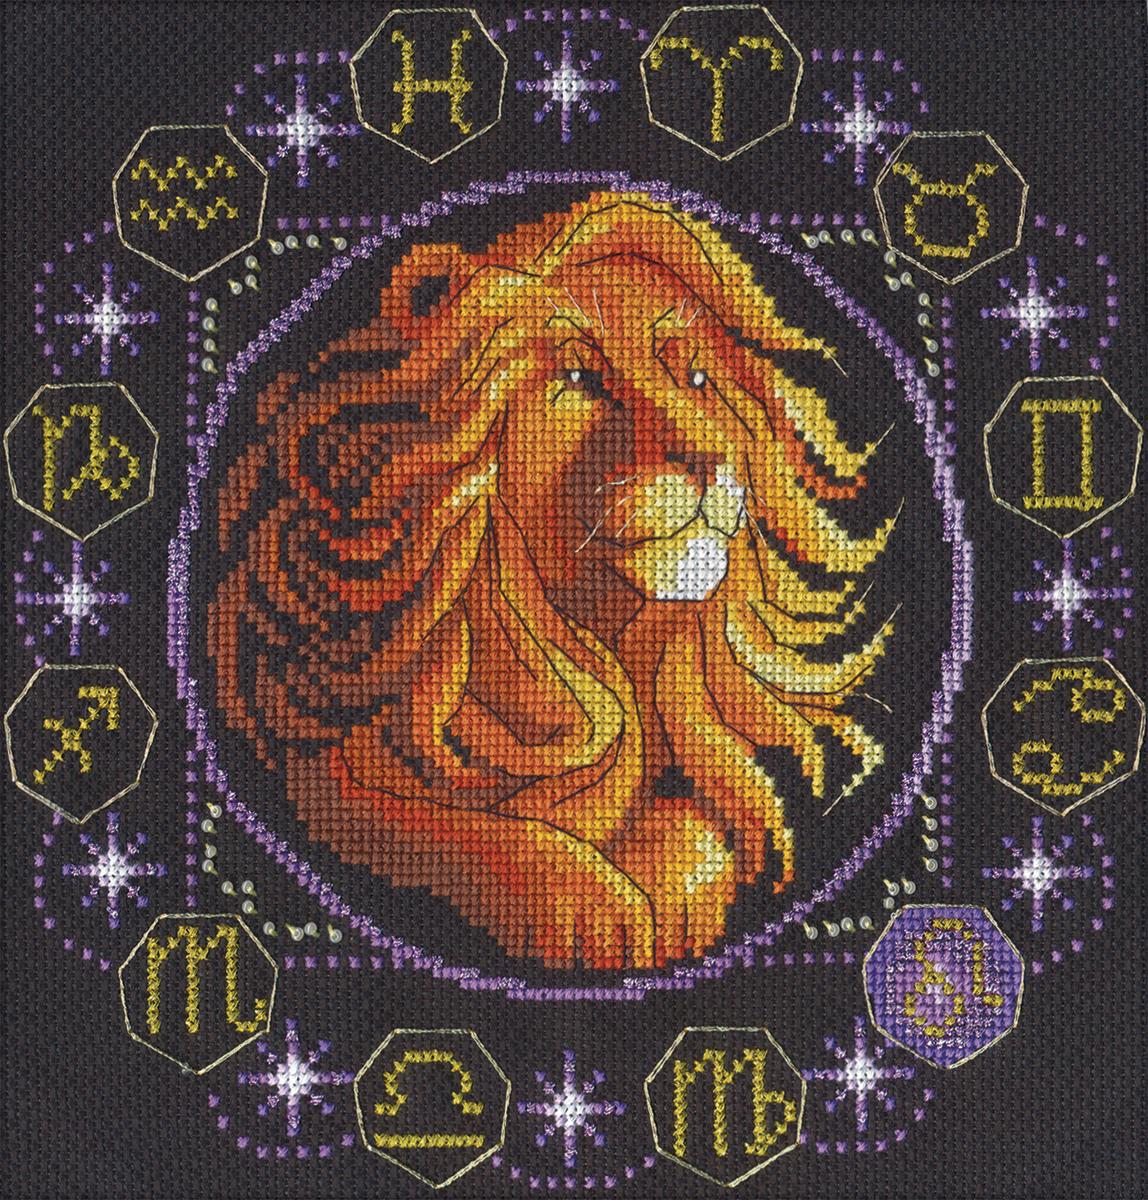 Схемы вышивки бисером знаки зодиака